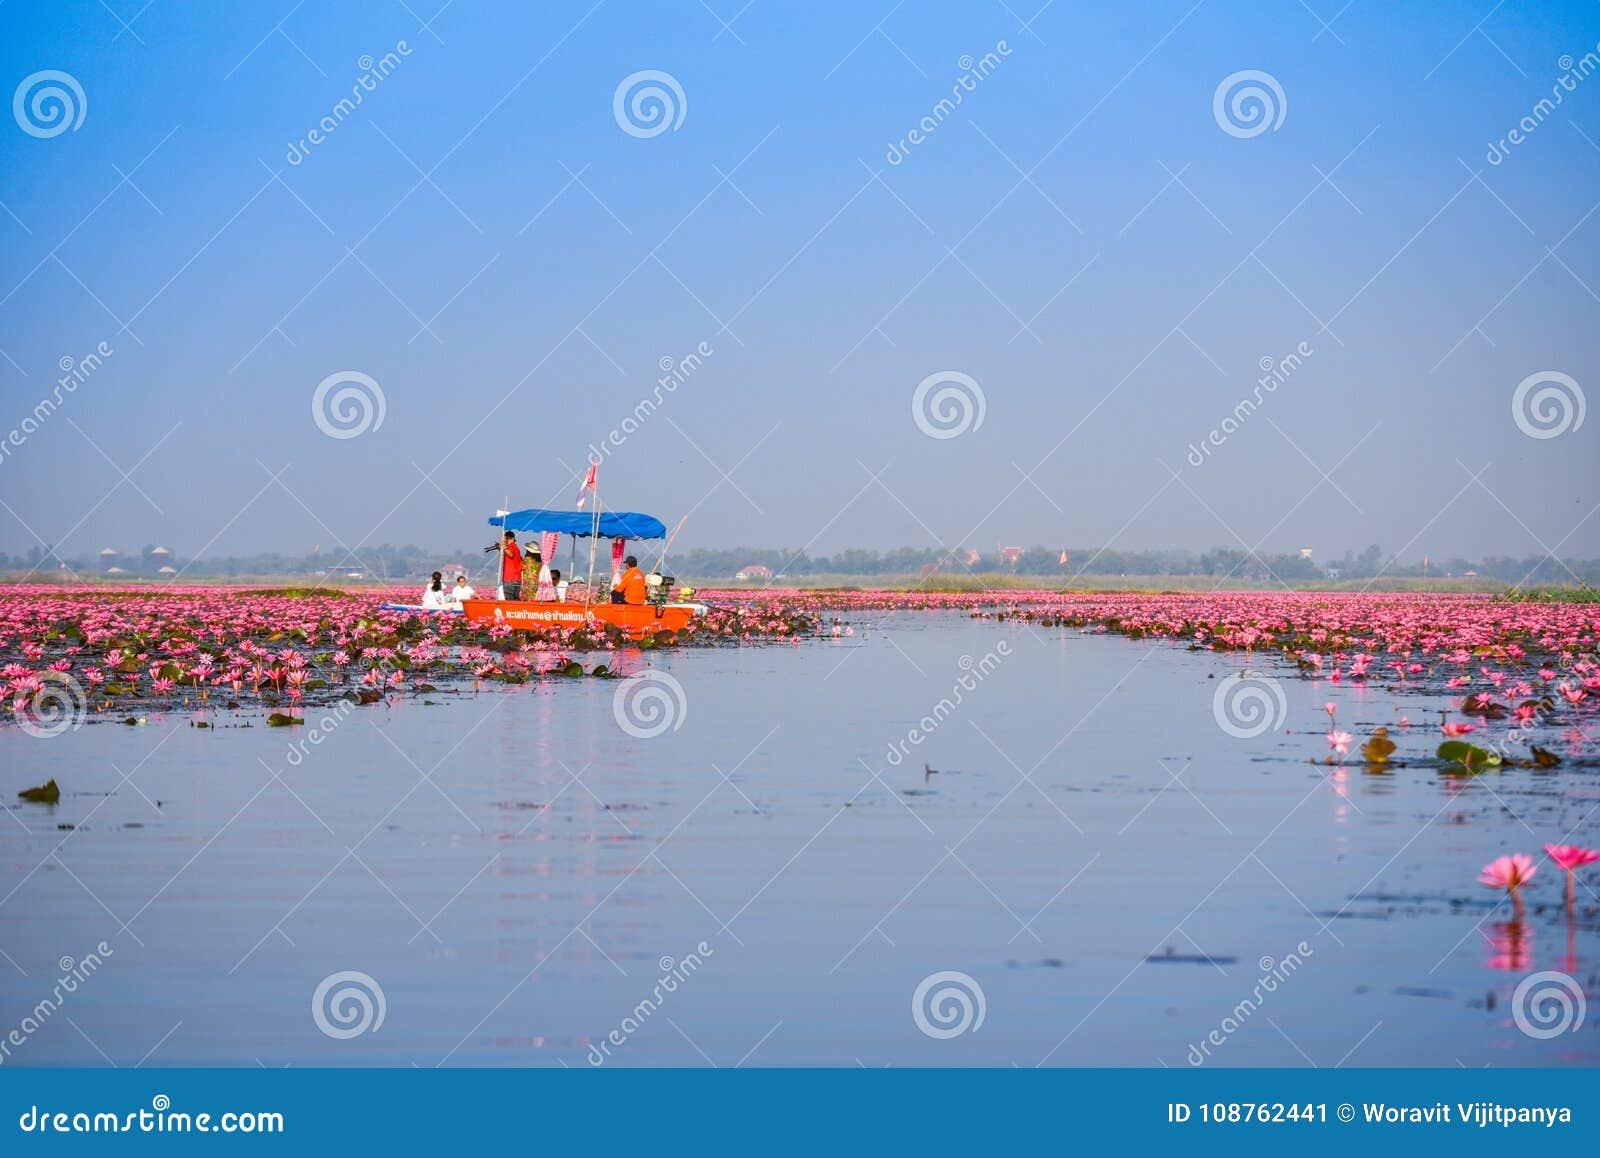 boat Lily thai